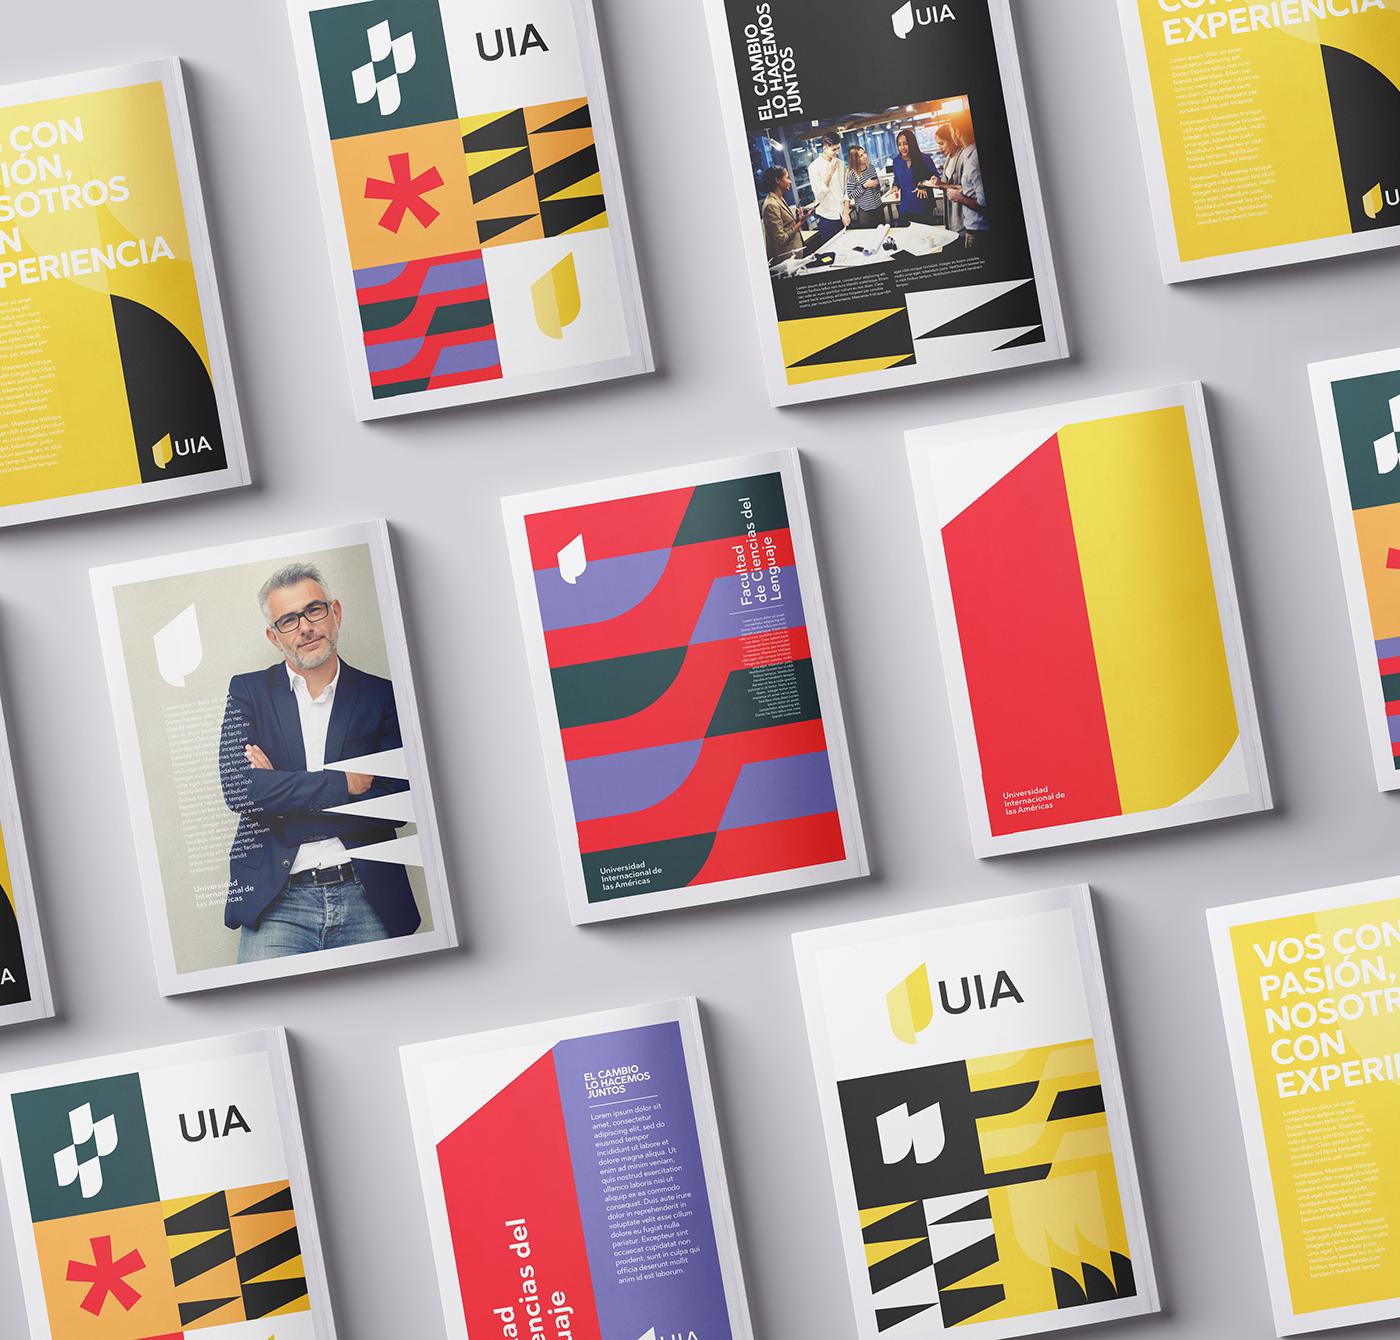 Universidad Internacional de las Américas - UIA on Behance